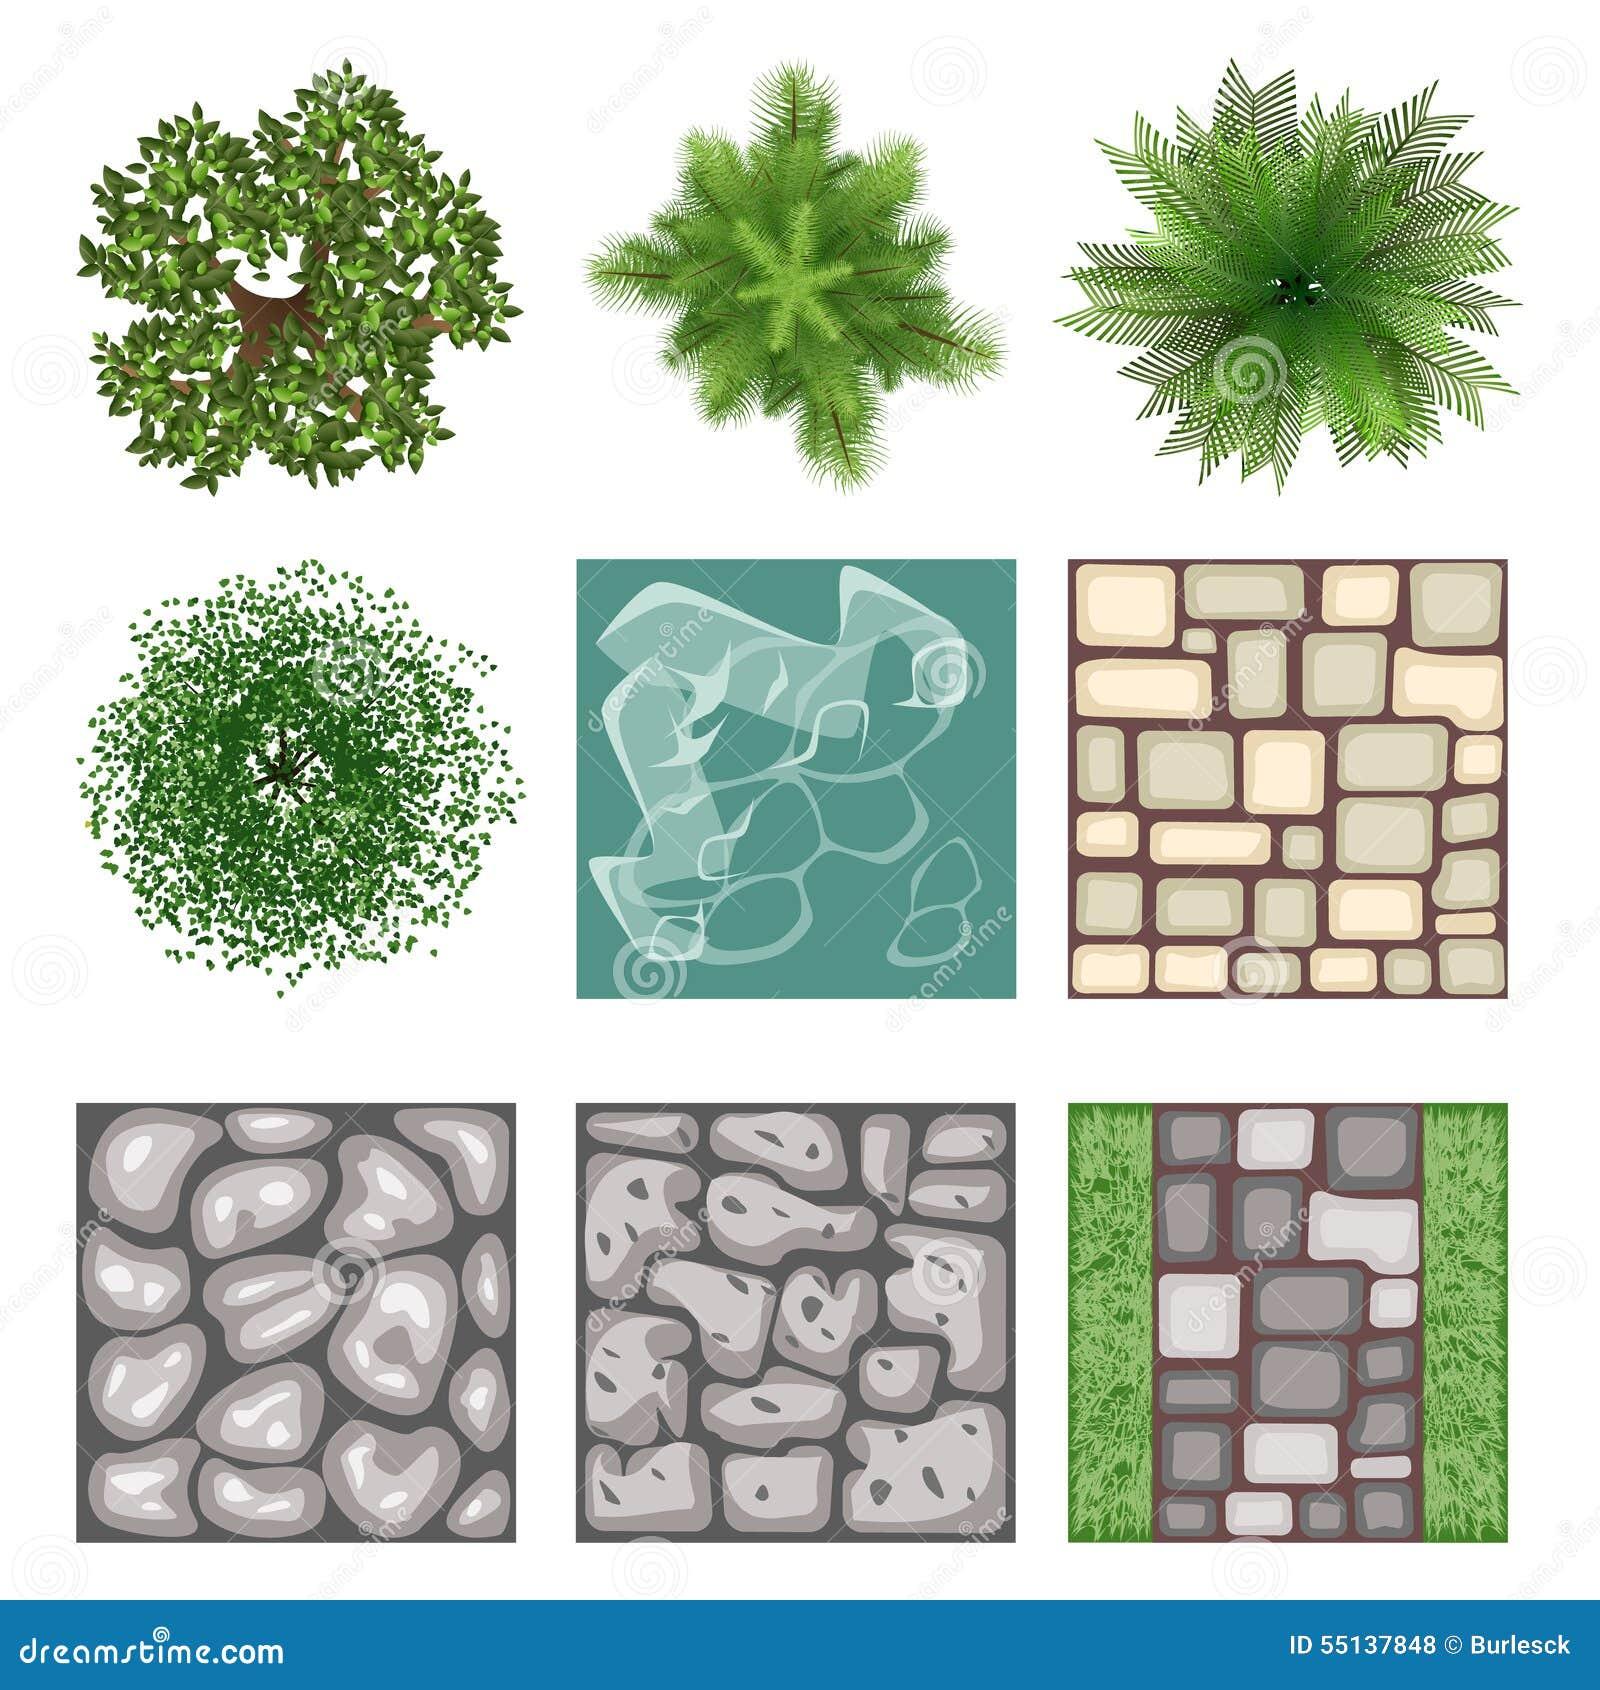 Landscape Design Top View Vector Elements Stock Vector